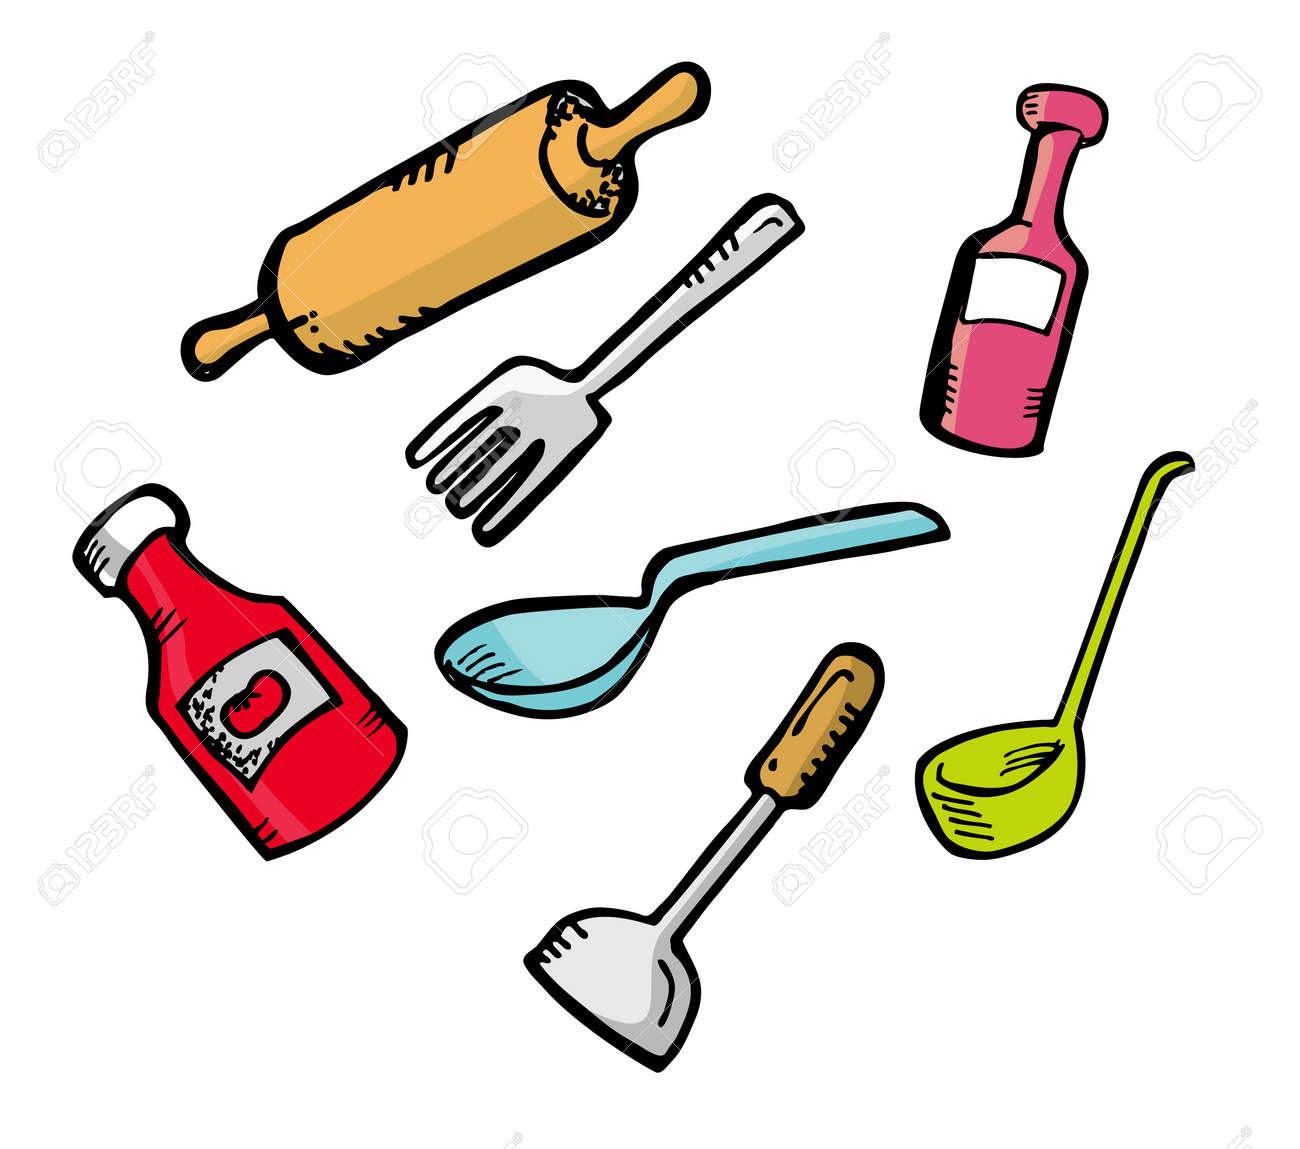 Dessin ustensile de cuisine 28 images coloriage une for Cuisine ustensile